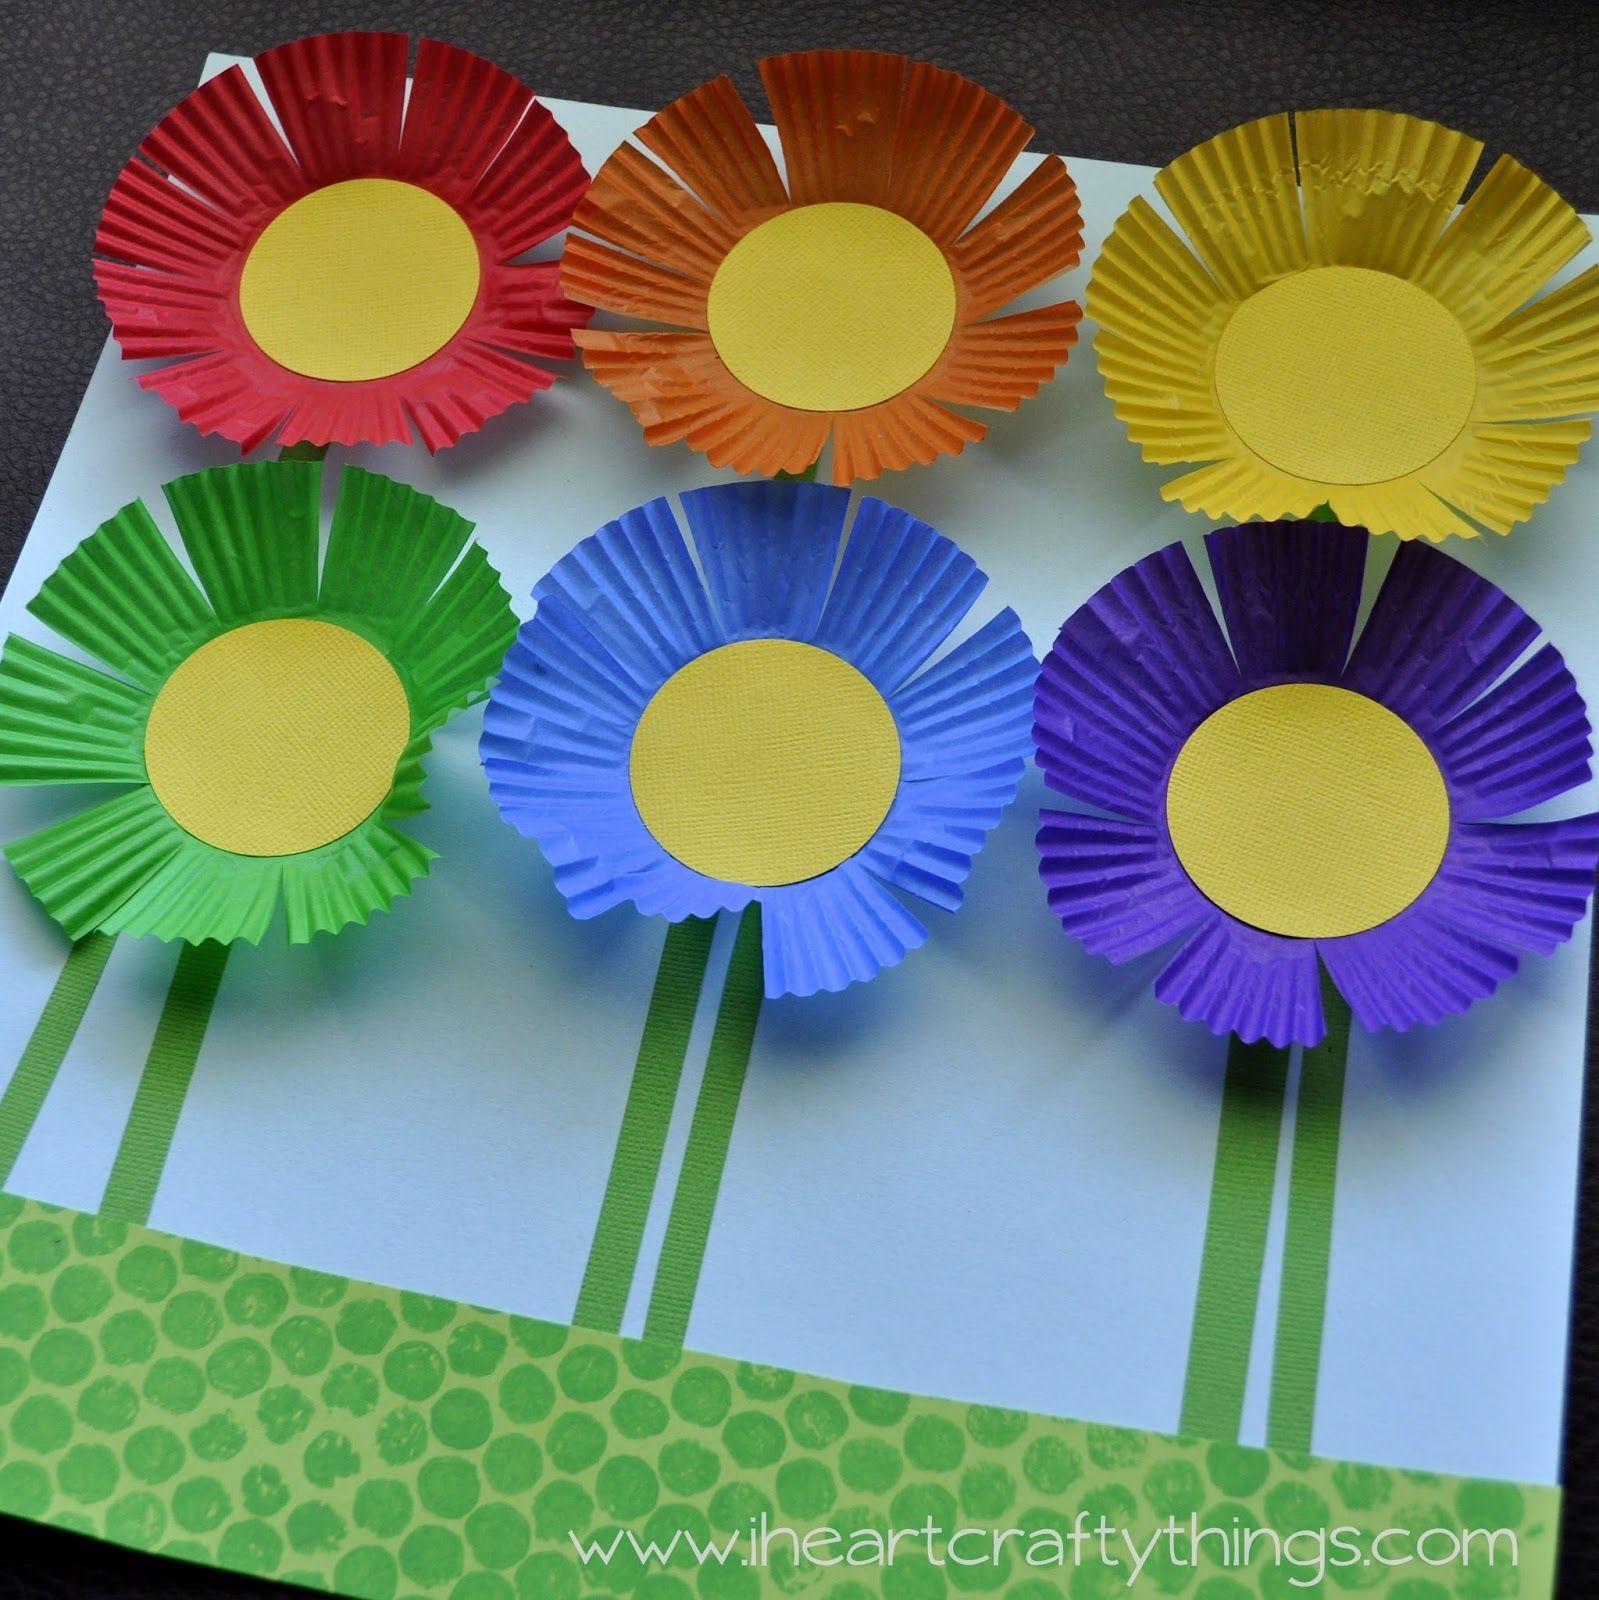 Uncategorized Paper Craft Work For Children nicole zarecki nzarecki on pinterest i heart crafty things planting a rainbow flower craft kids collage using paint